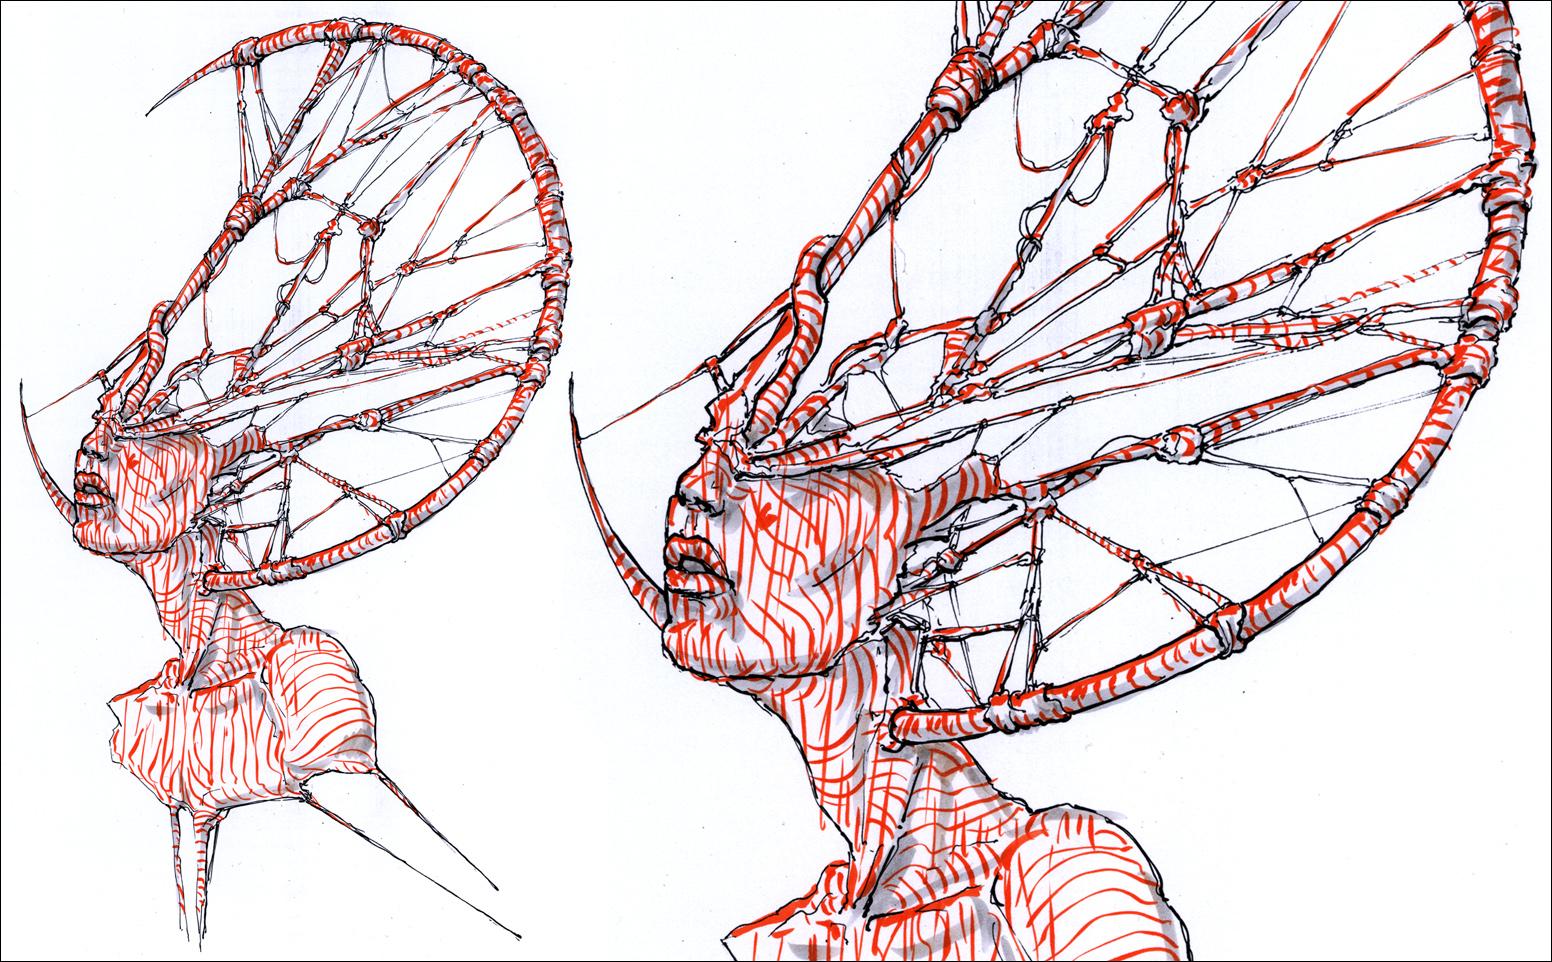 Dreamweaver by hypnothalamus